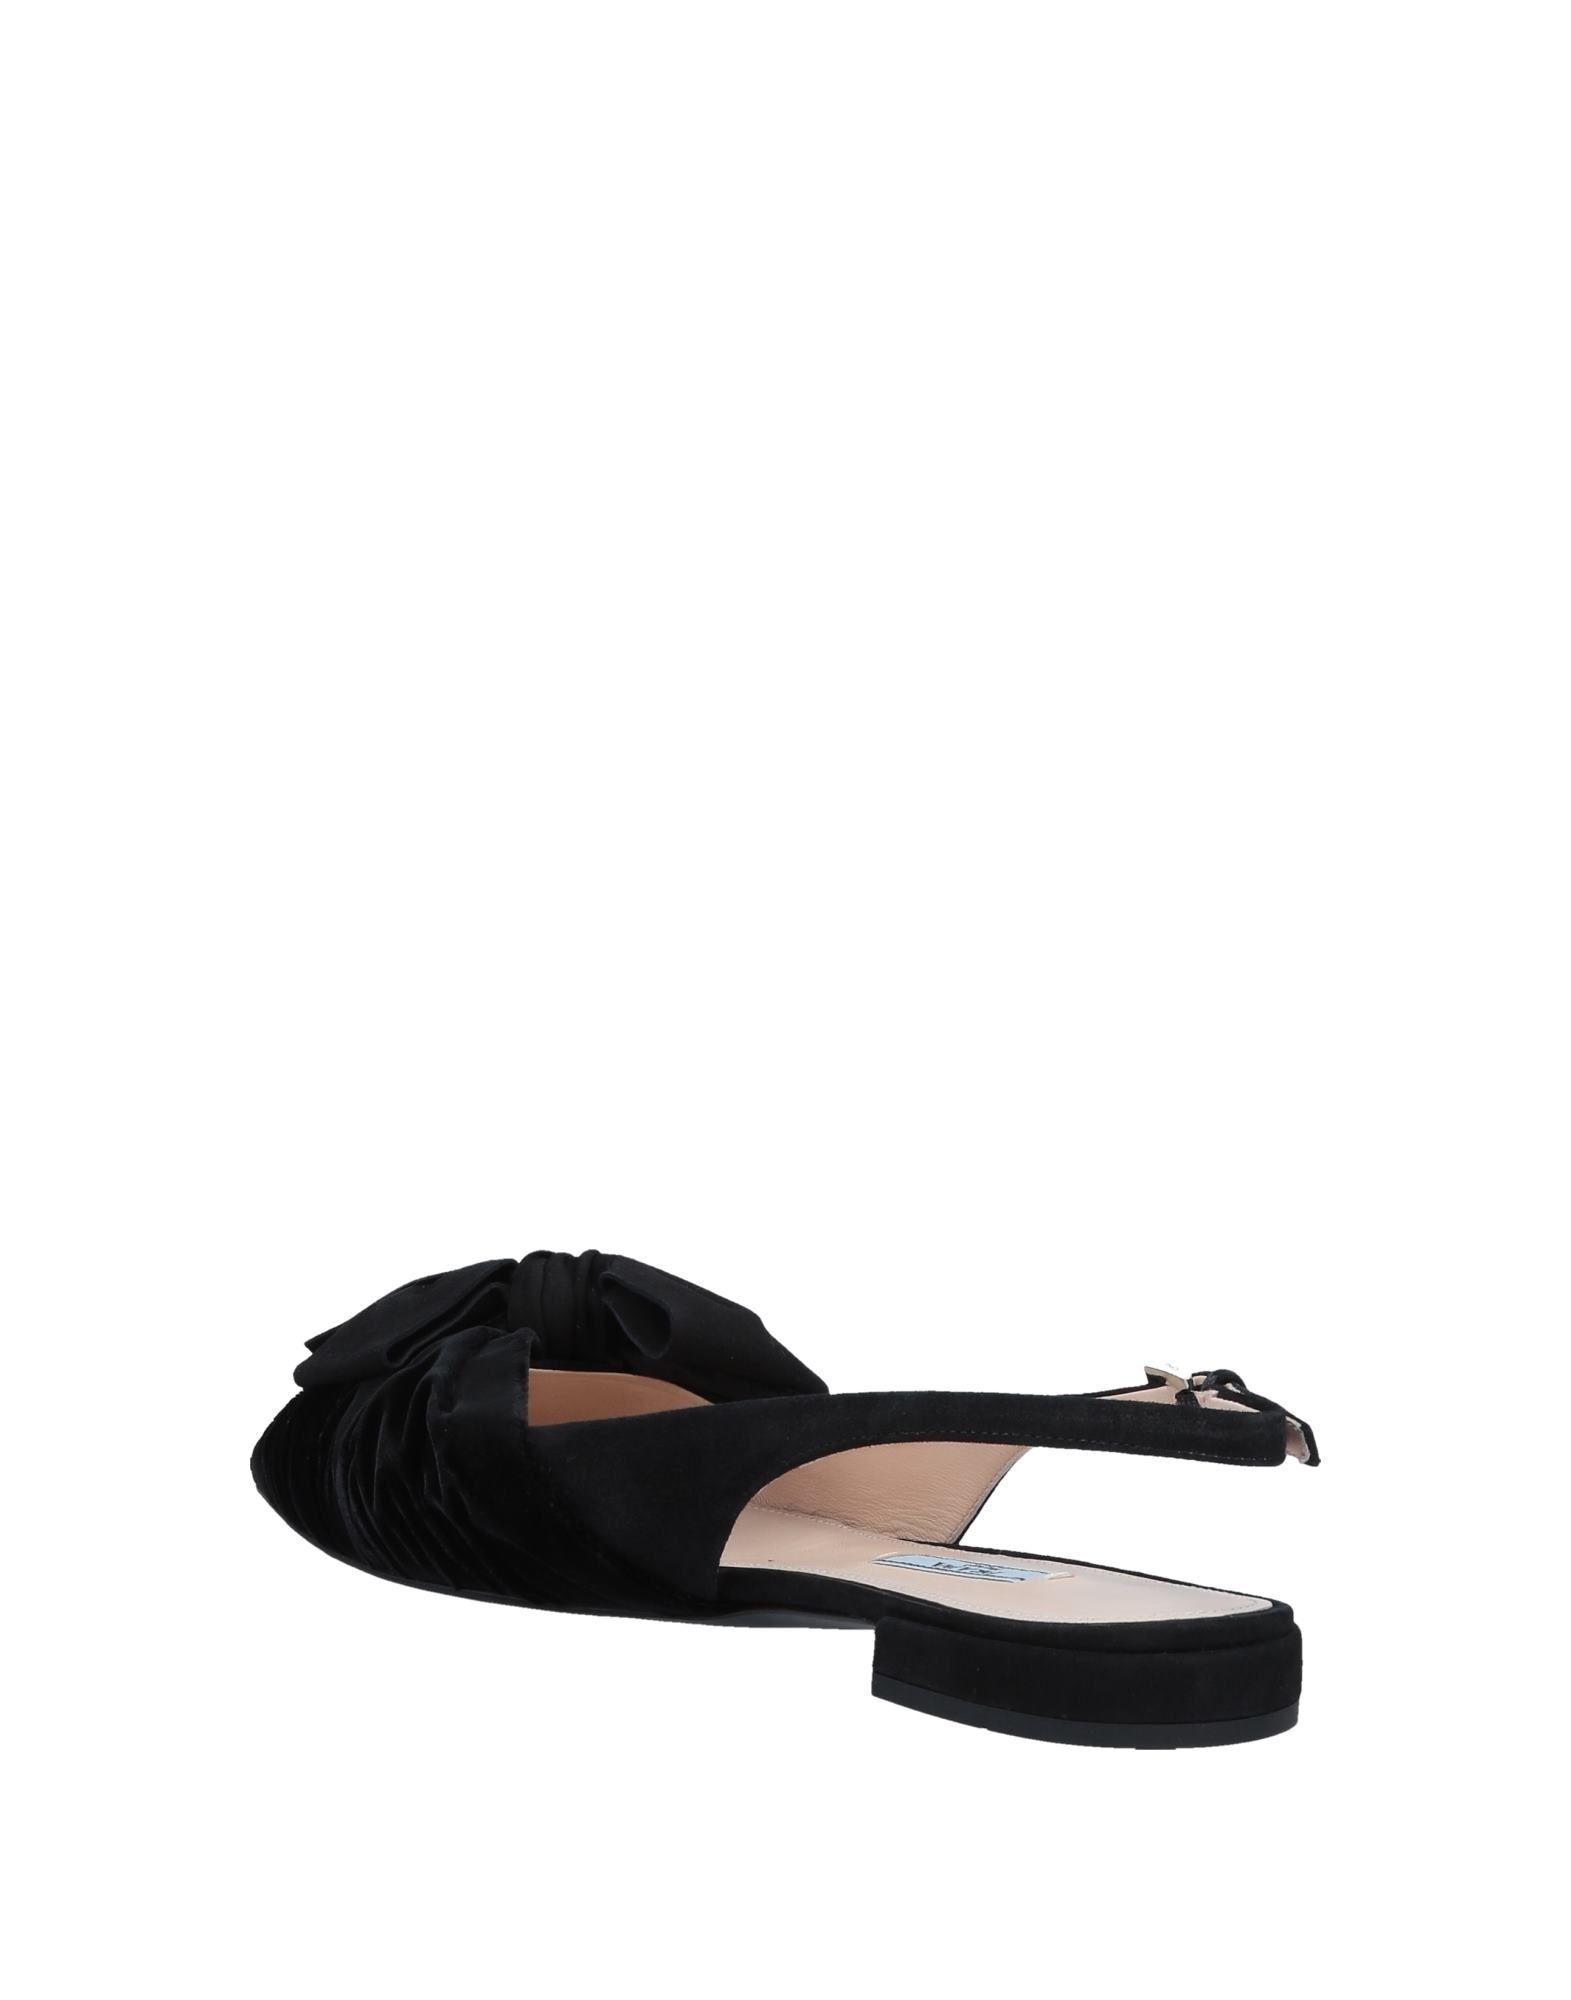 30c89834e4a Prada Ballet Flats in Black - Lyst